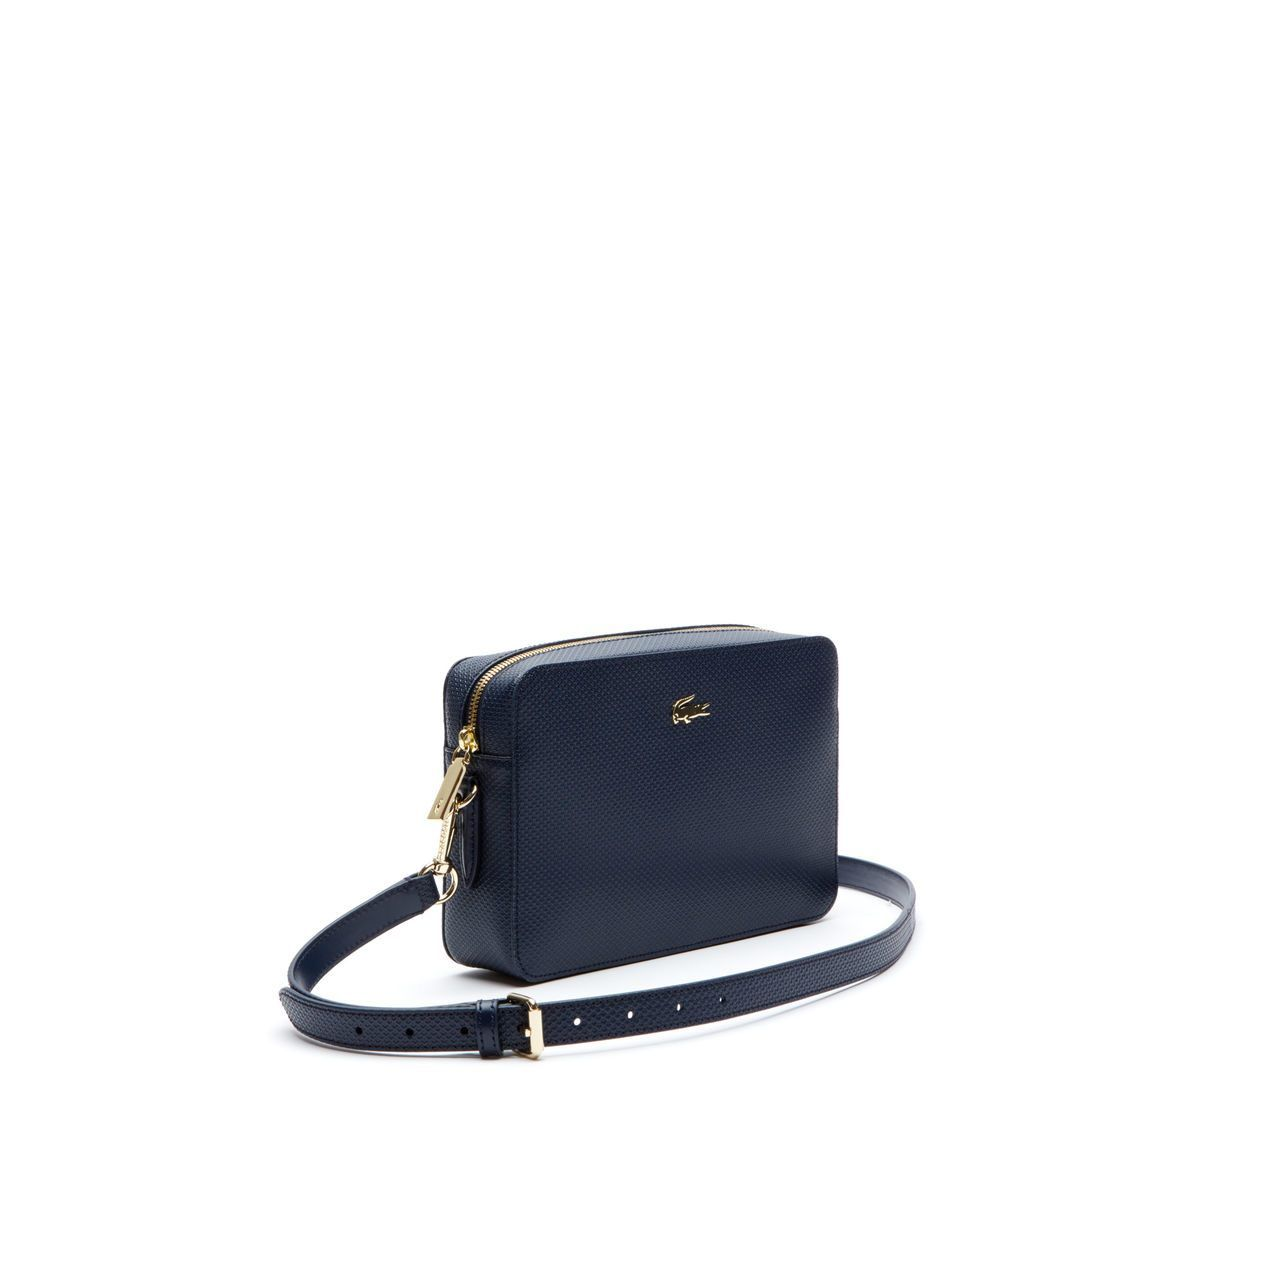 2fb07b8a5e Women's Chantaco Piqué Leather Square Shoulder Bag in 2019 | roba ...